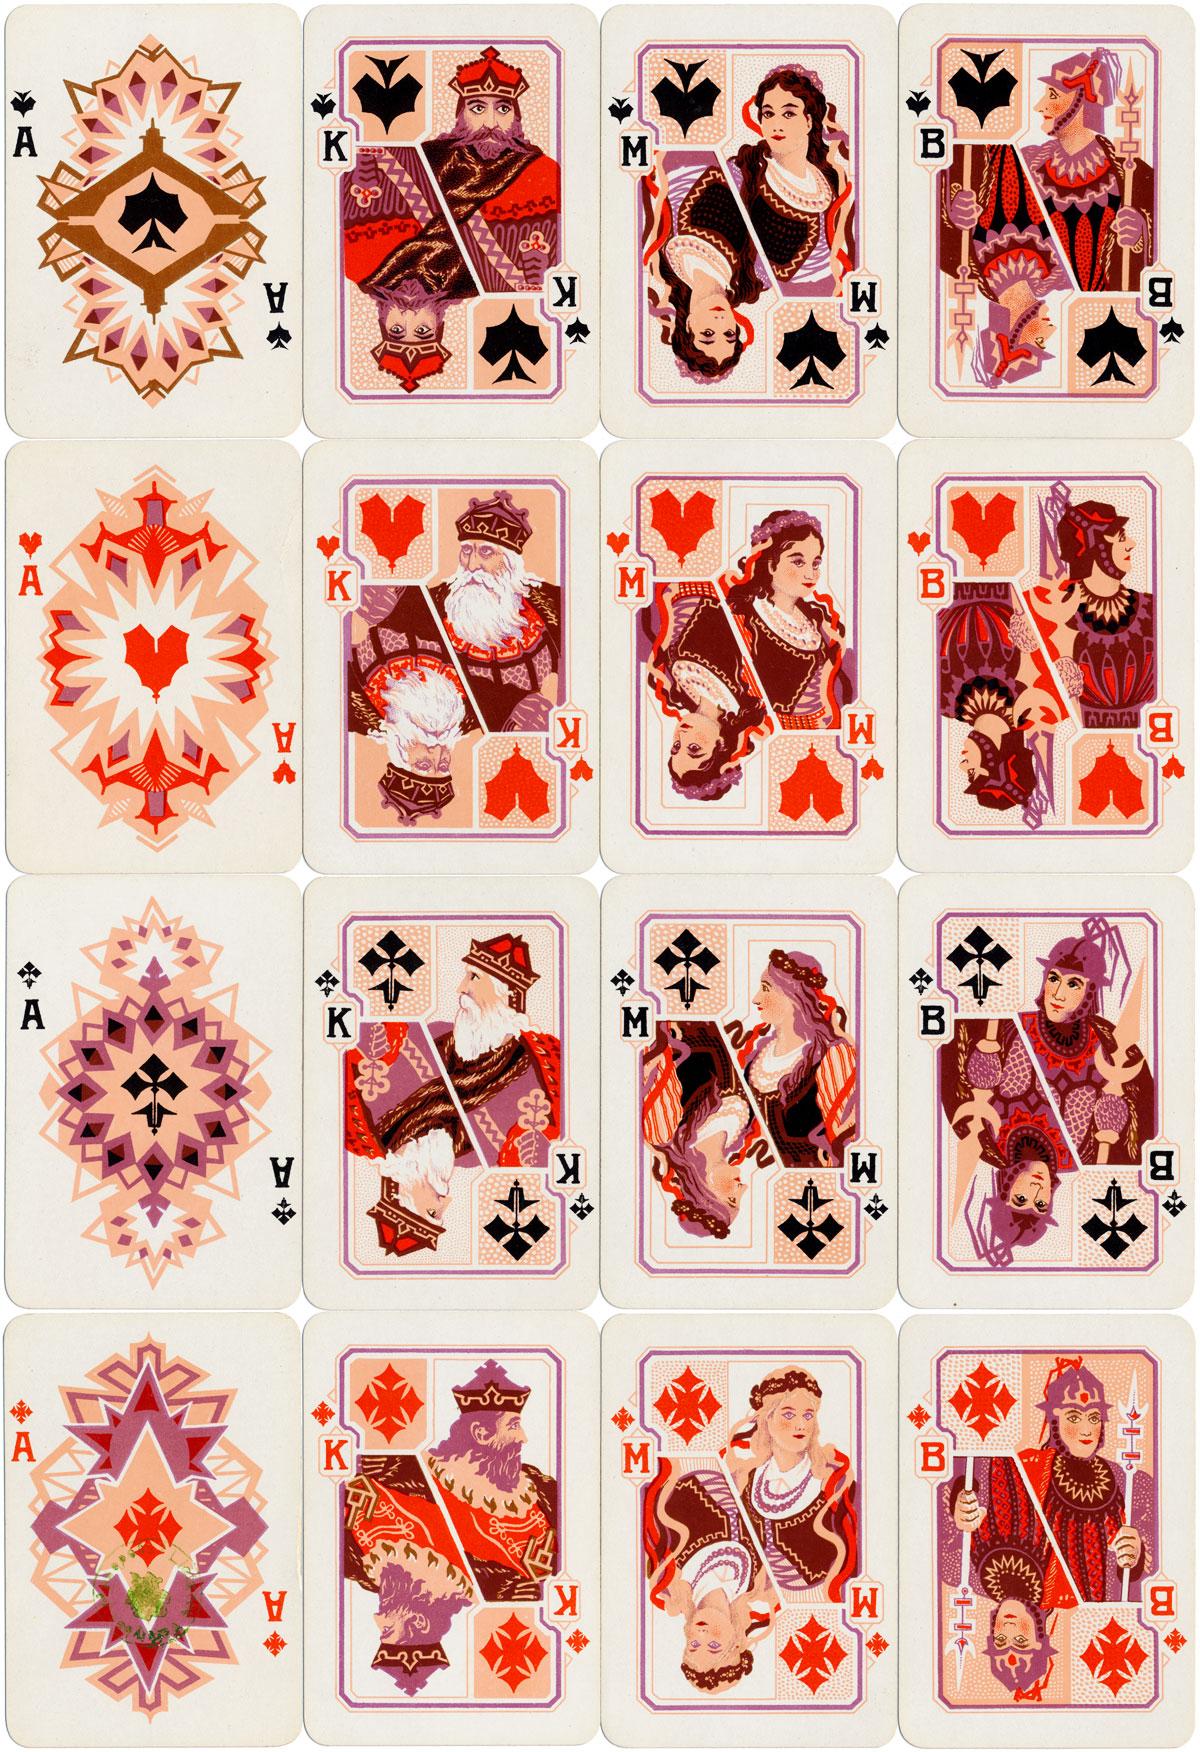 Gedimino Stulpai playing cards made by Spindulys Printing Co., c.1930